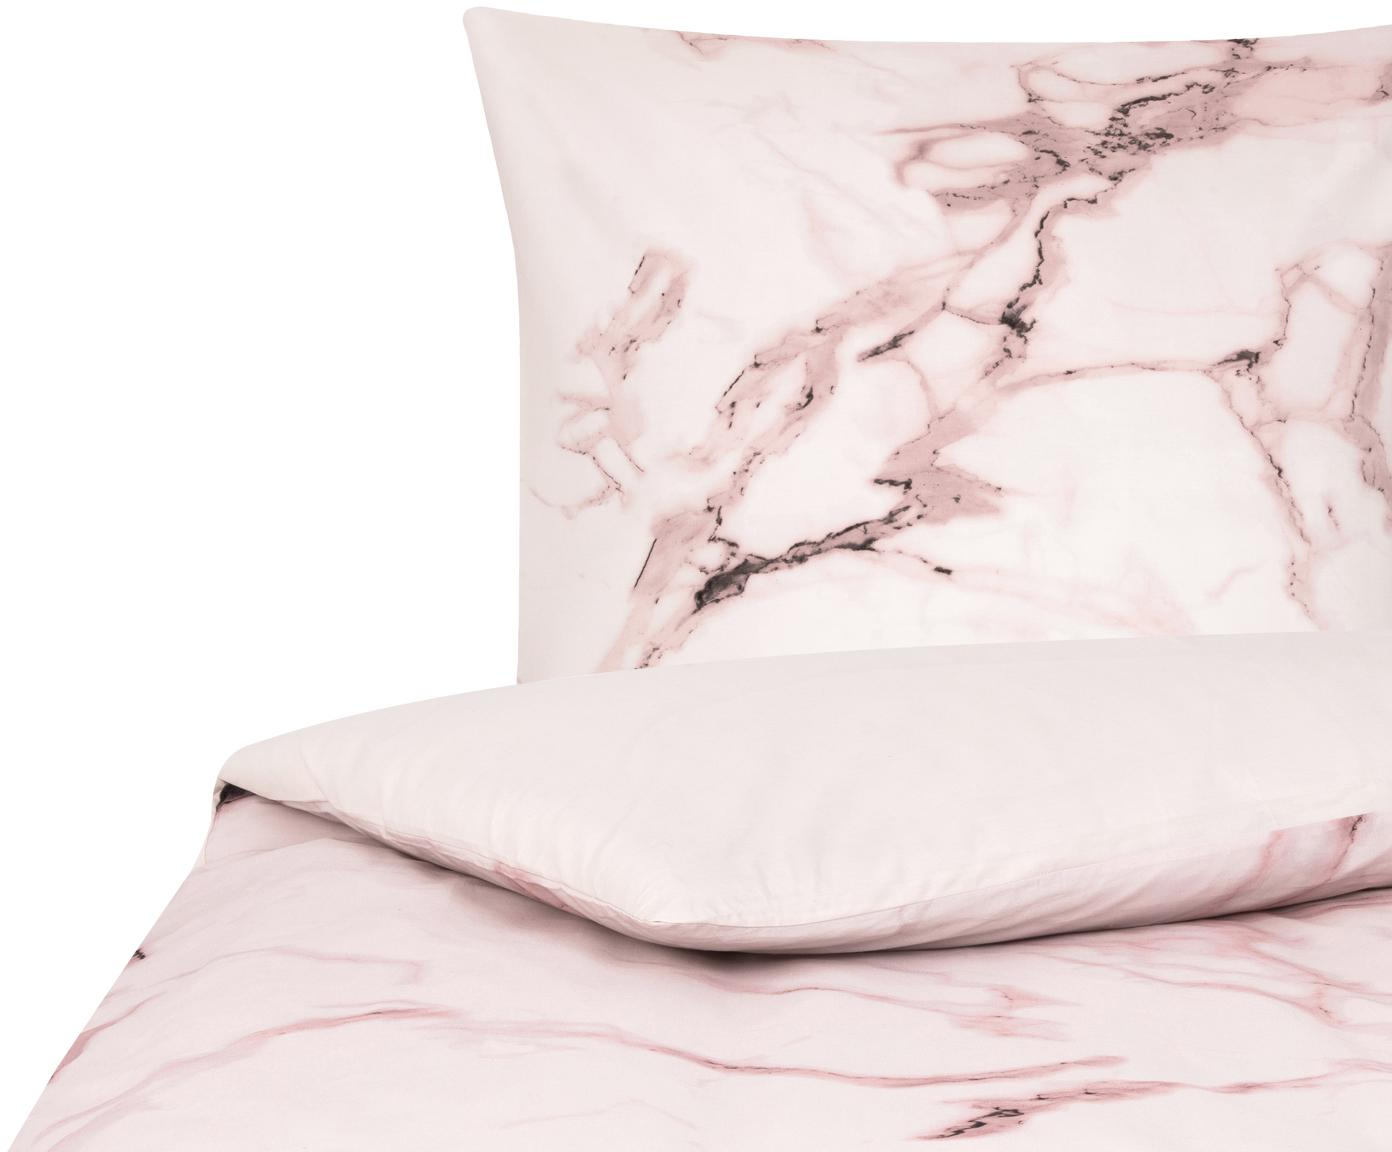 Baumwollperkal-Bettwäsche Malin mit Marmor-Muster, Webart: Perkal Fadendichte 200 TC, Marmormuster, Rosa, 155 x 220 cm + 1 Kissen 80 x 80 cm